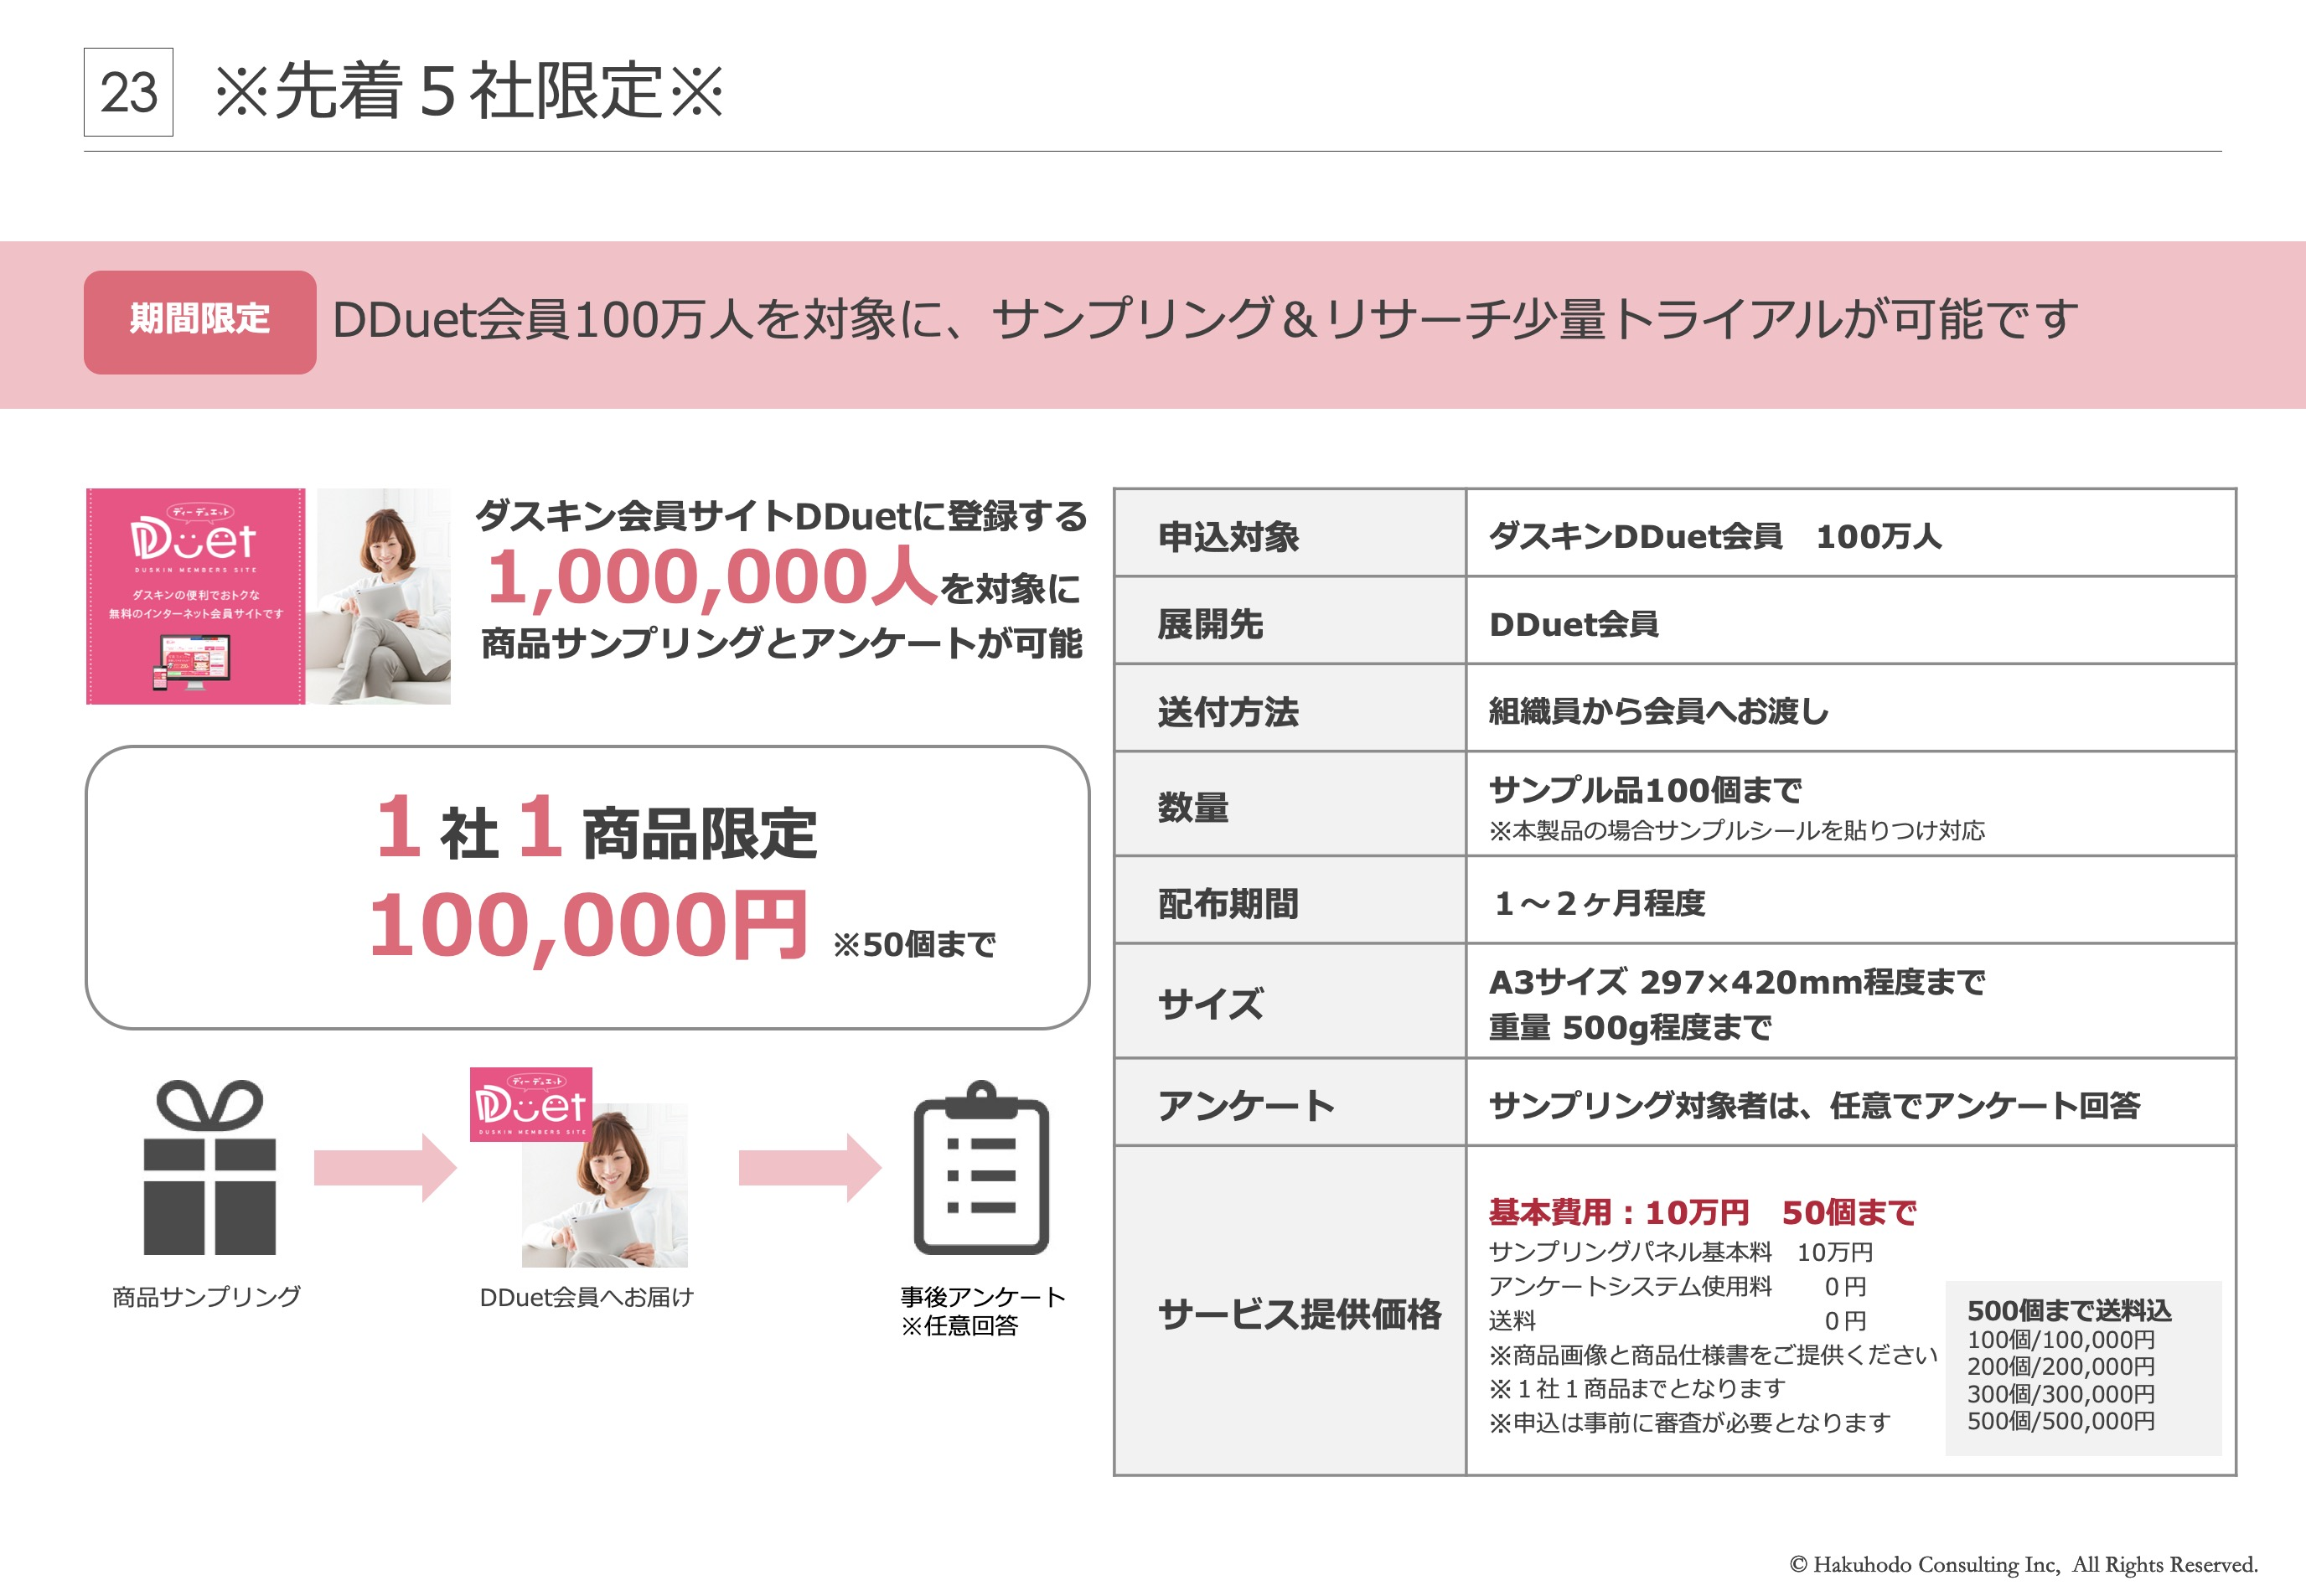 DDuet会員100万人を対象に、サンプリング&リサーチ少量トライアルが可能です